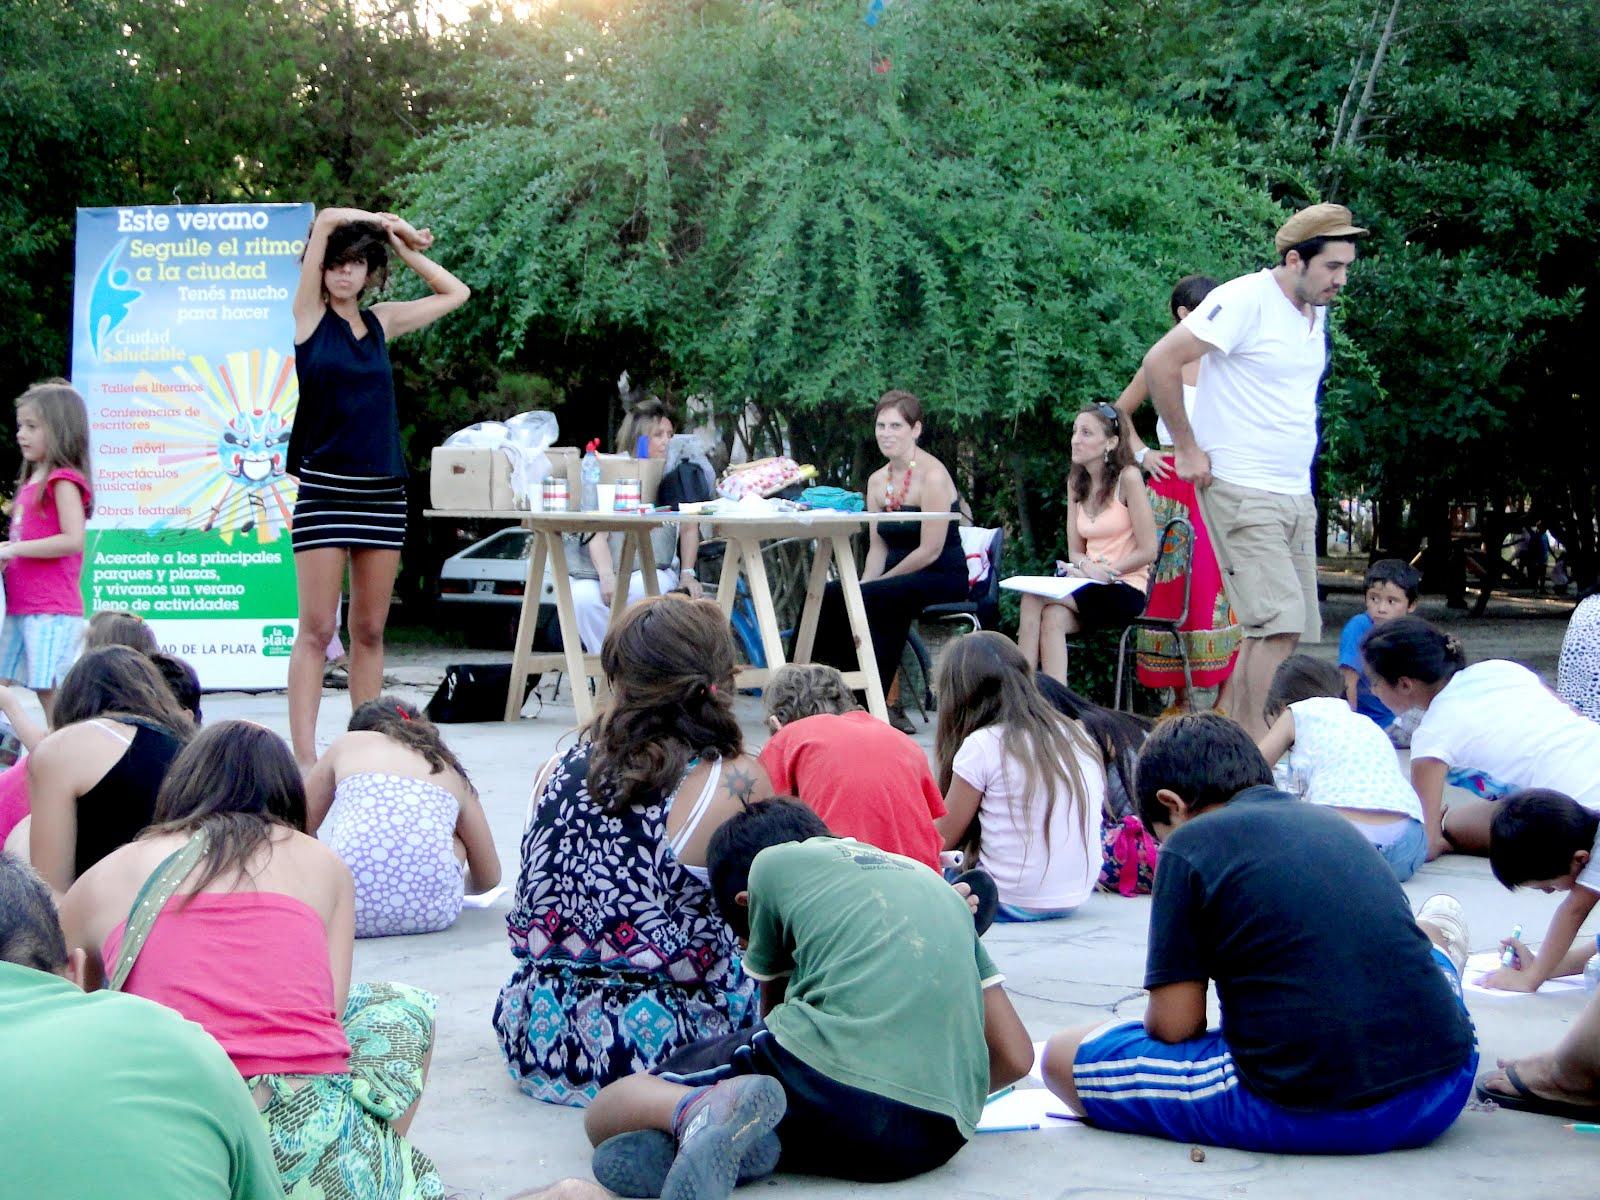 la plata cultura talleres multidisciplinarios febrero On jardin botanico talleres